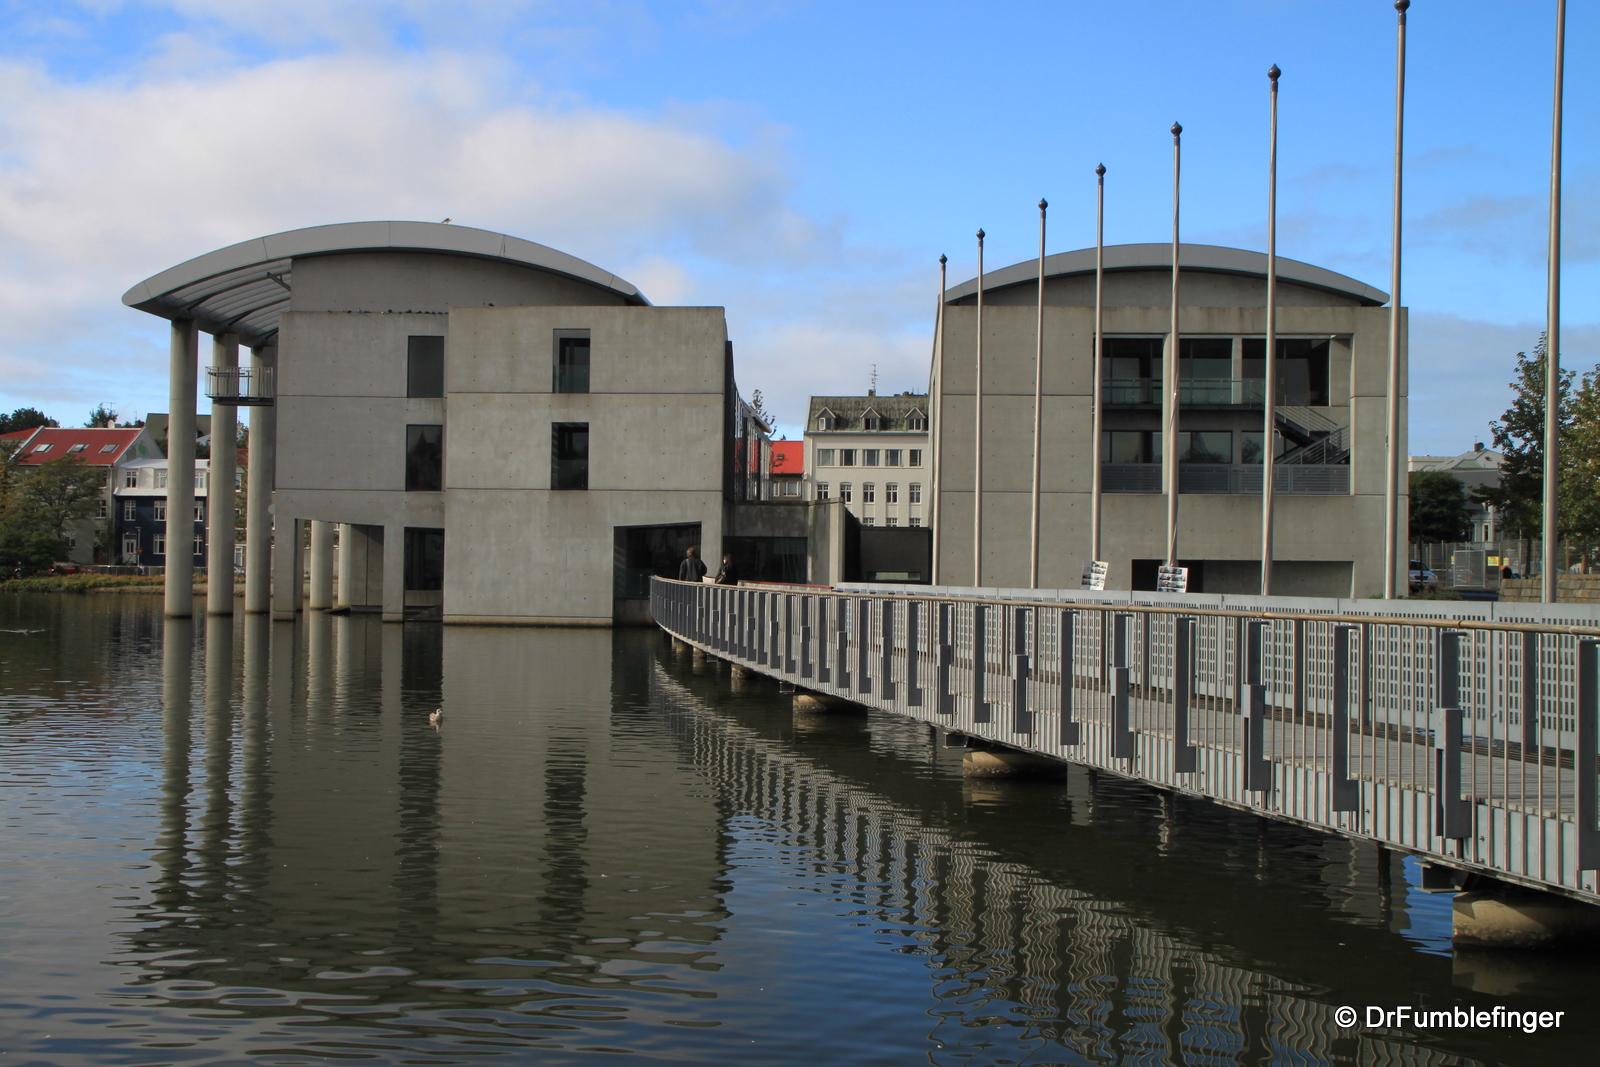 City Hall (Radhaus)